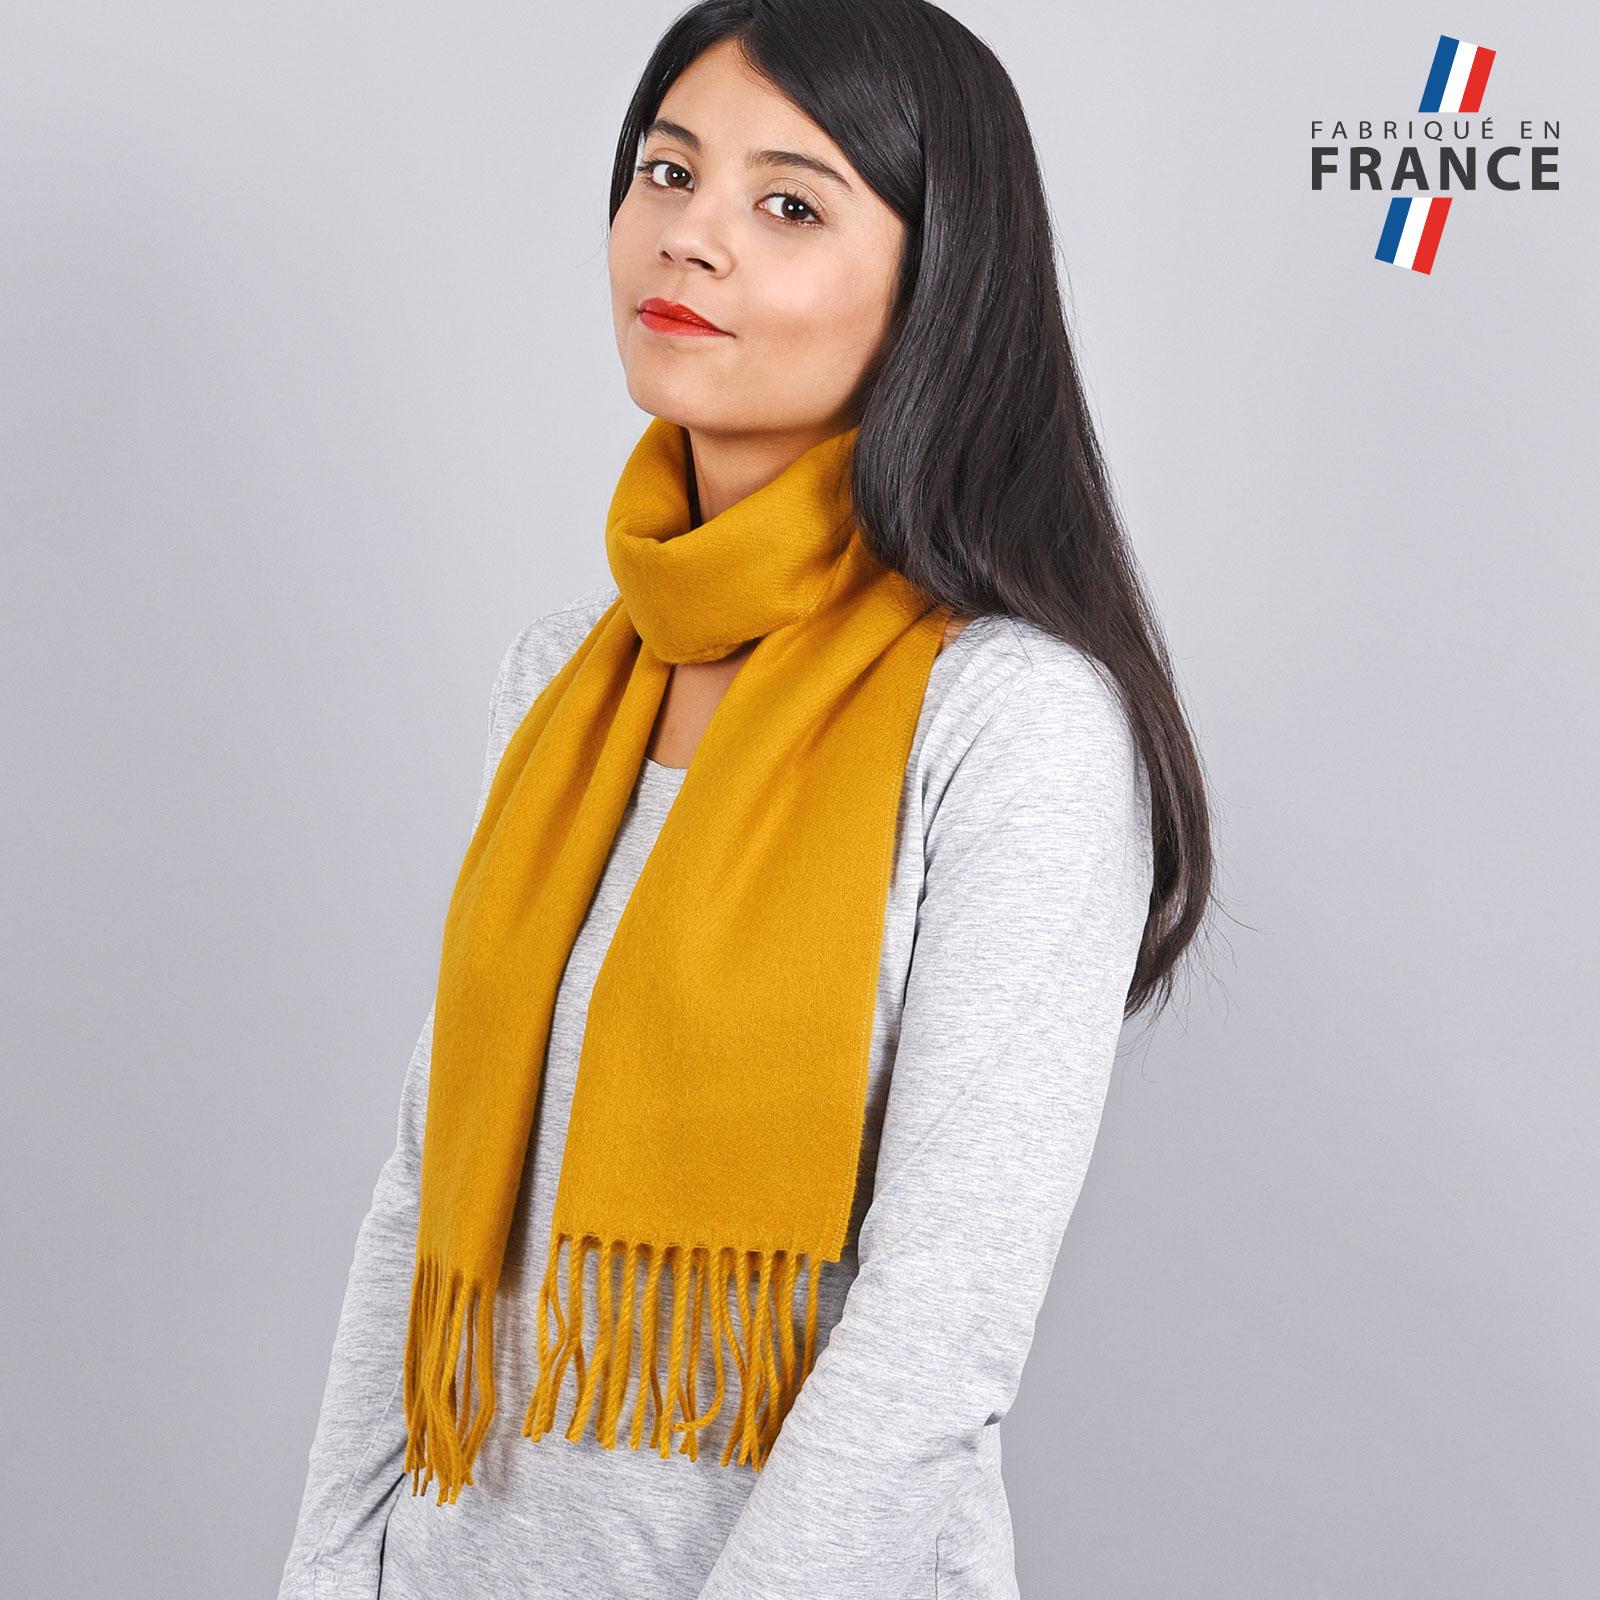 AT-03241-VF16-LB_FR-echarpe-franges-orange-femme-fabrication-francaise